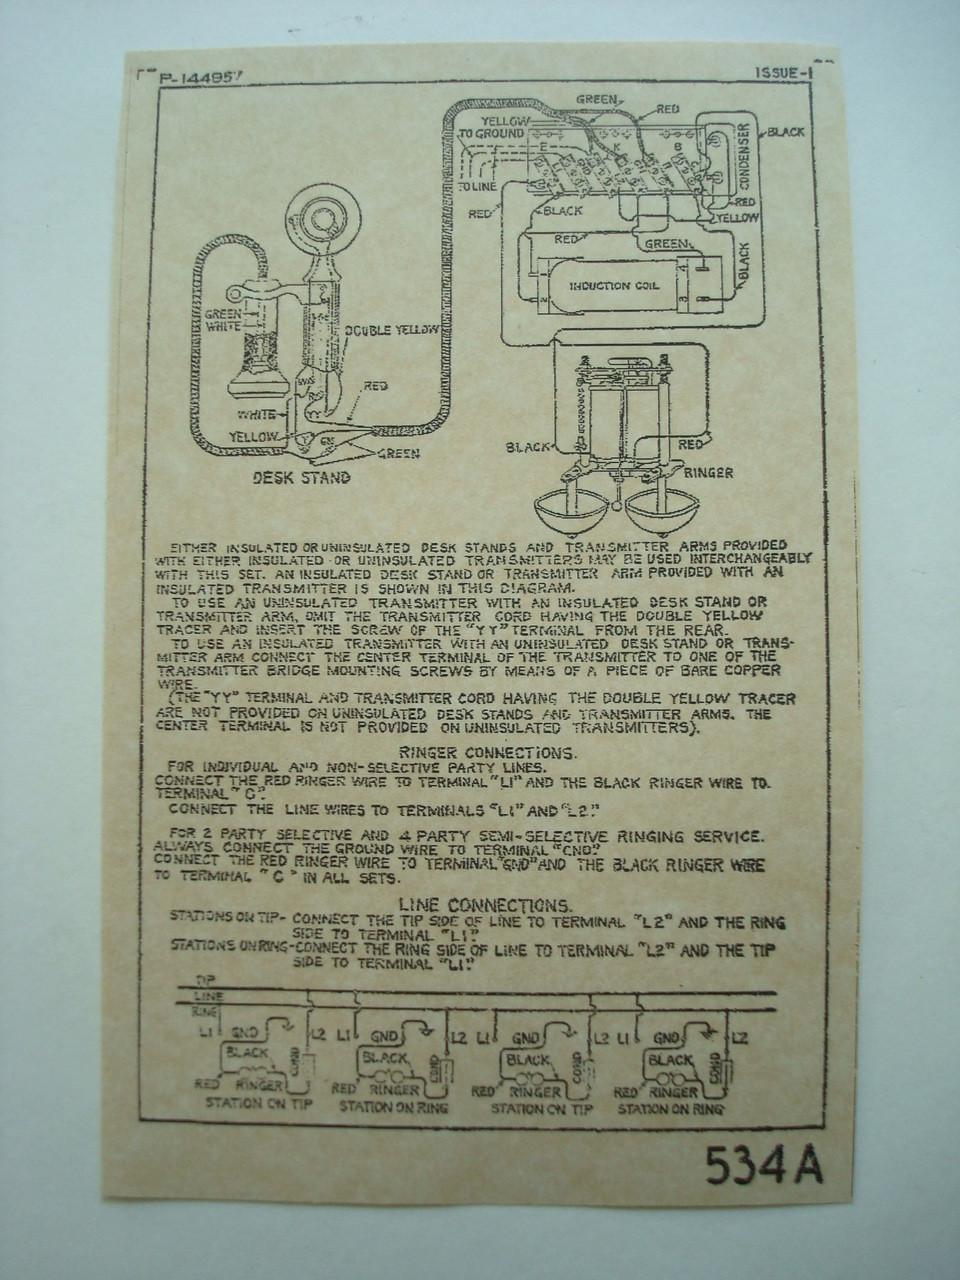 Wiring Diagram Crank Telephone Chicago Auto Electrical Wiring Crank  Telephone Wiring Diagram Crank Telephone Wiring Diagram